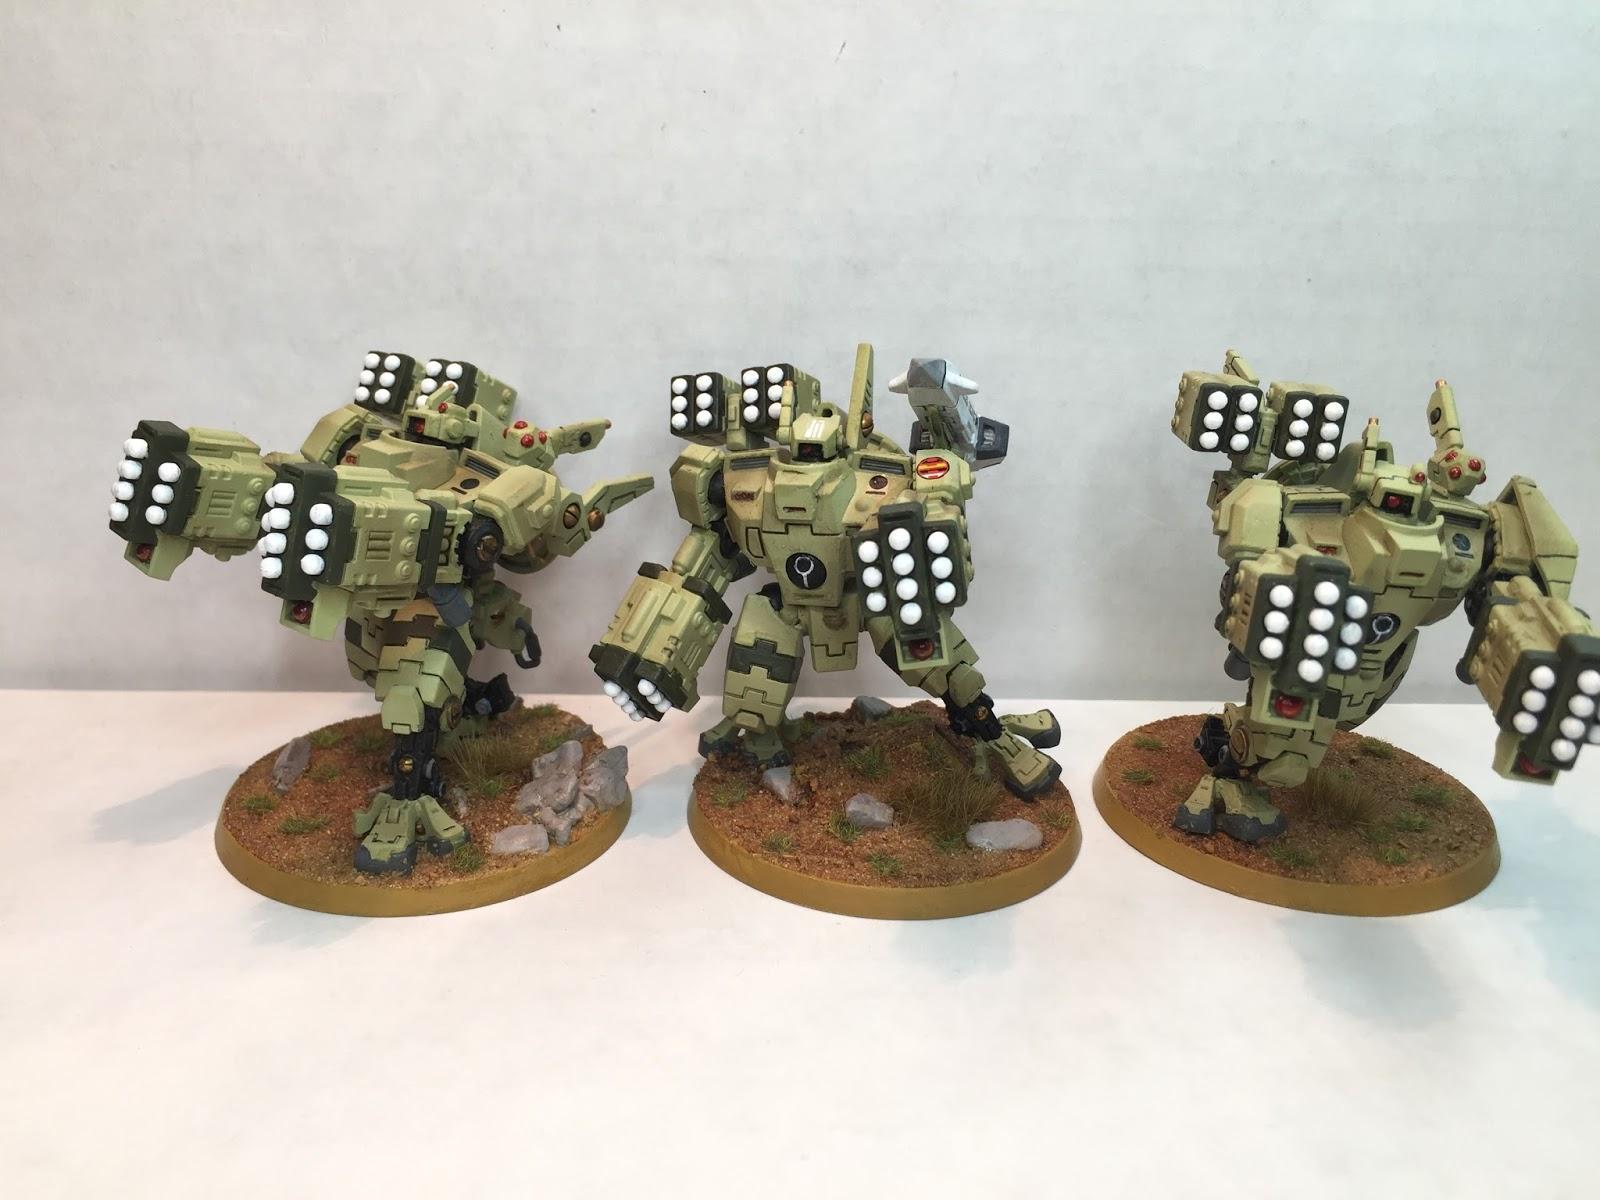 Army, Battle, Battlesuit, Broadsides, Missile, Suits, Tau, Warhammer 40,000, Xv-88